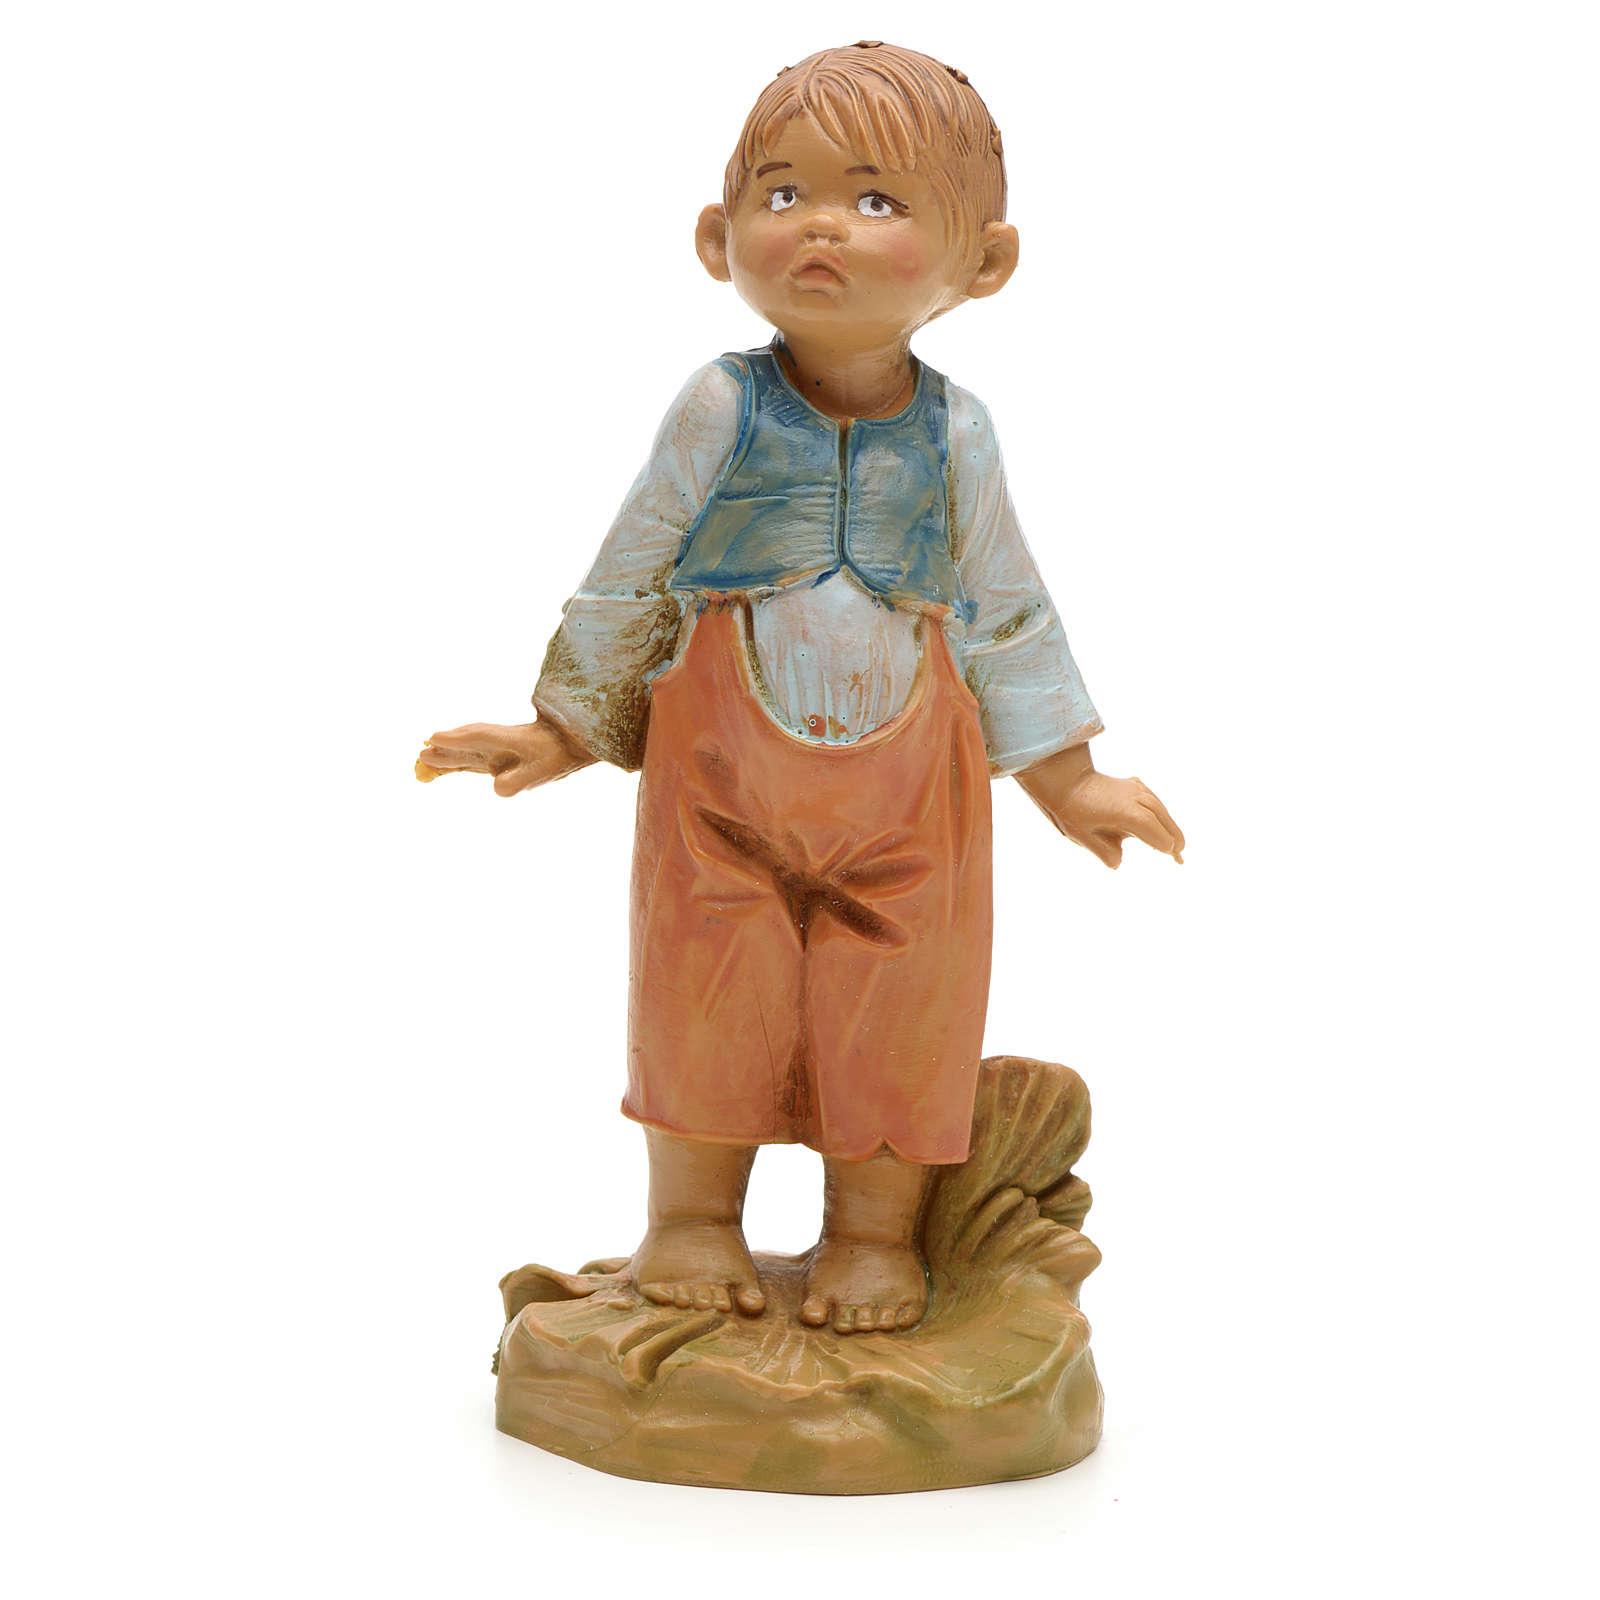 Bambino piccolo presepe 19 cm Fontanini 4